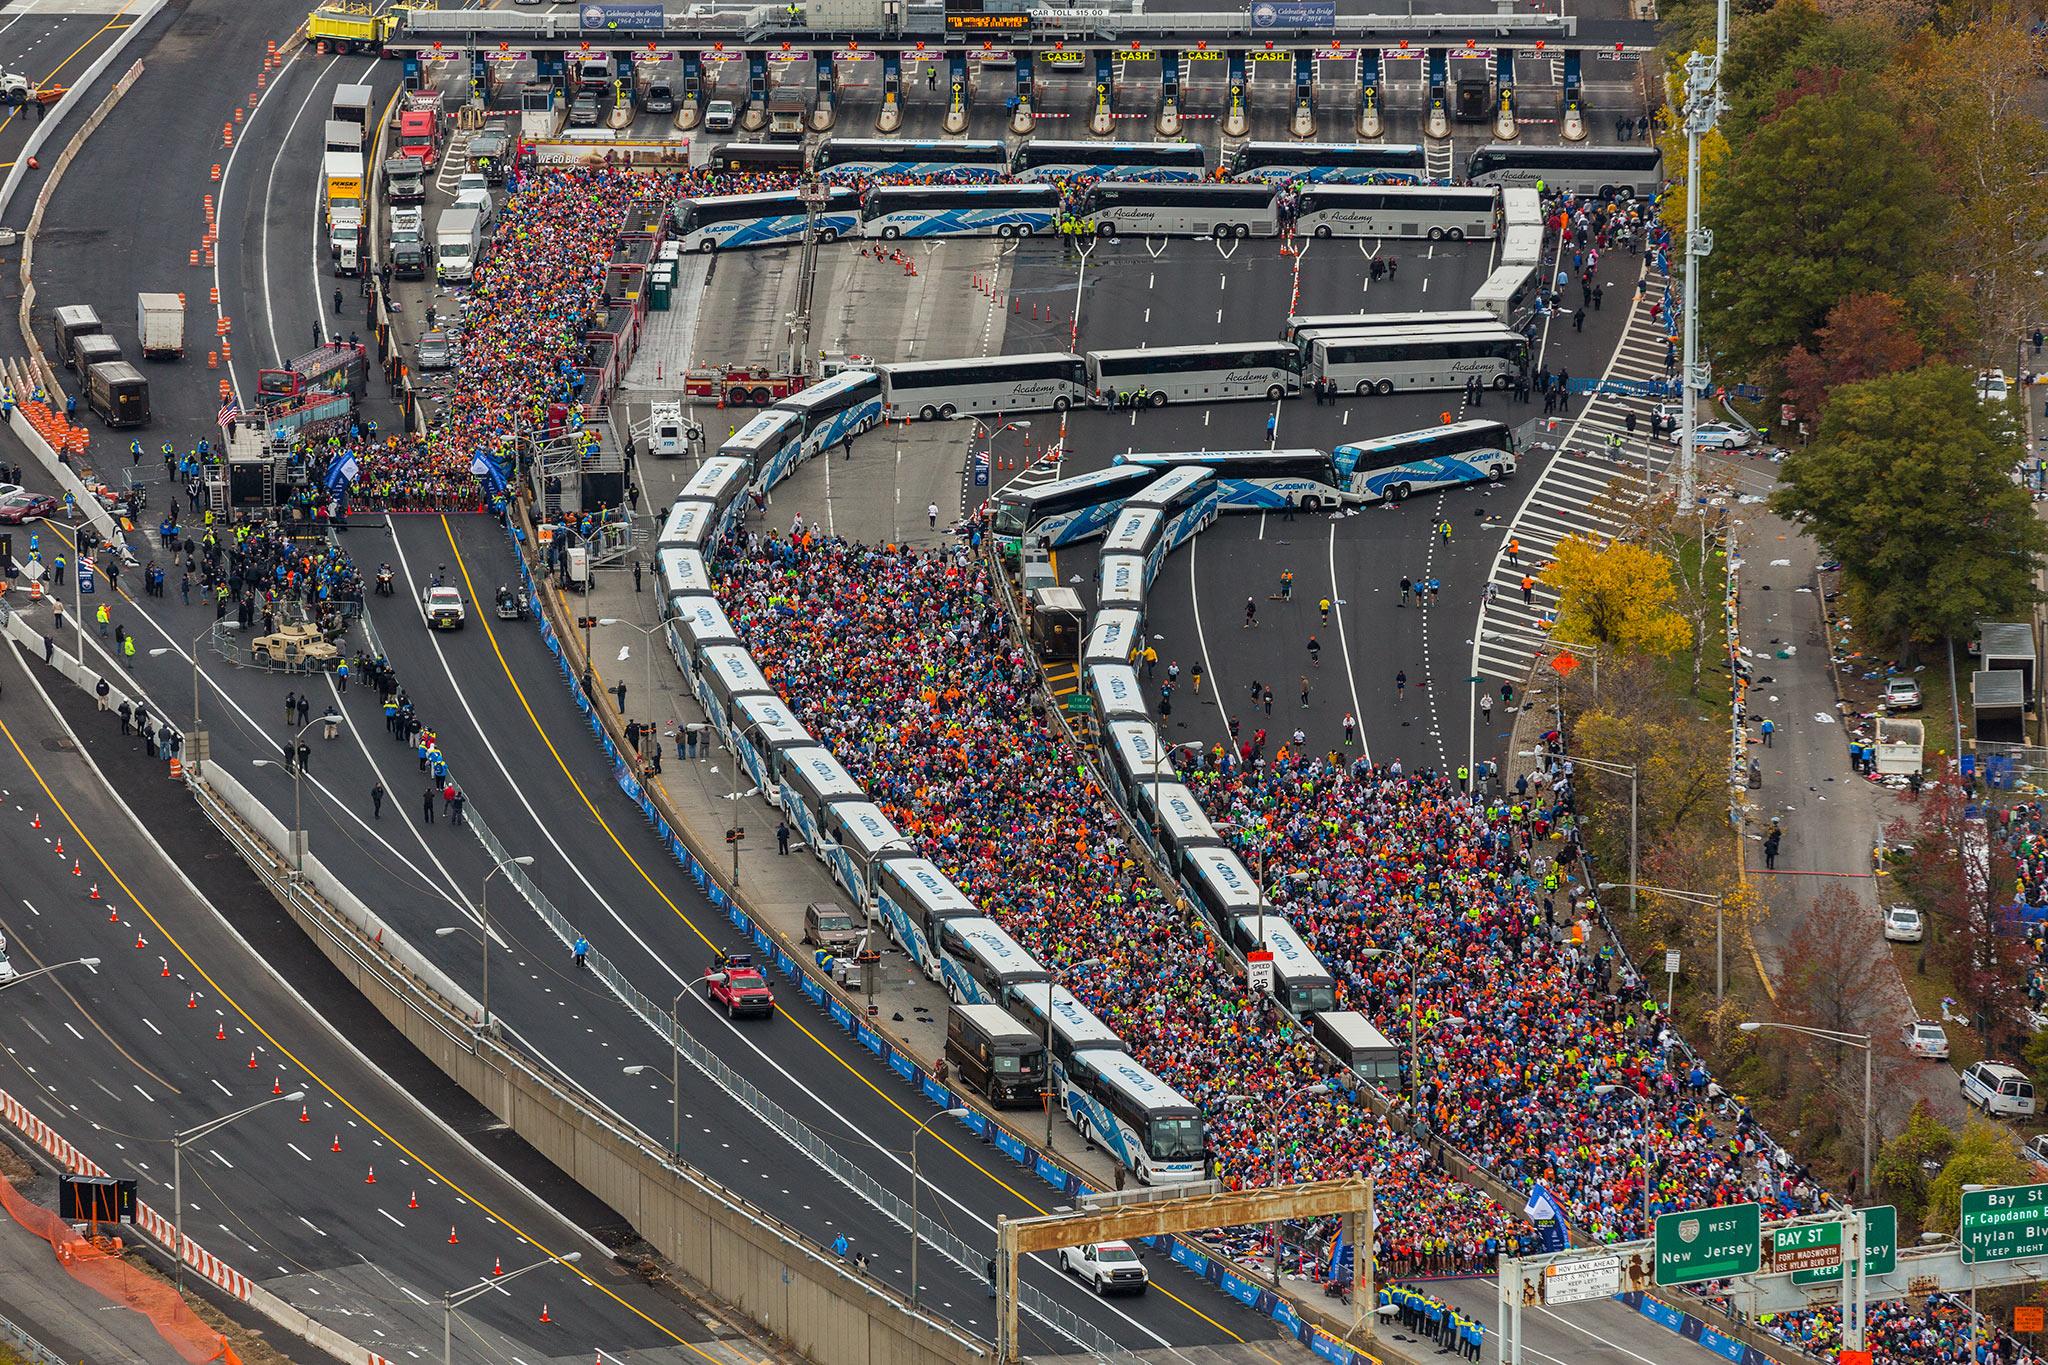 The 2014 New York City Marathon Espn